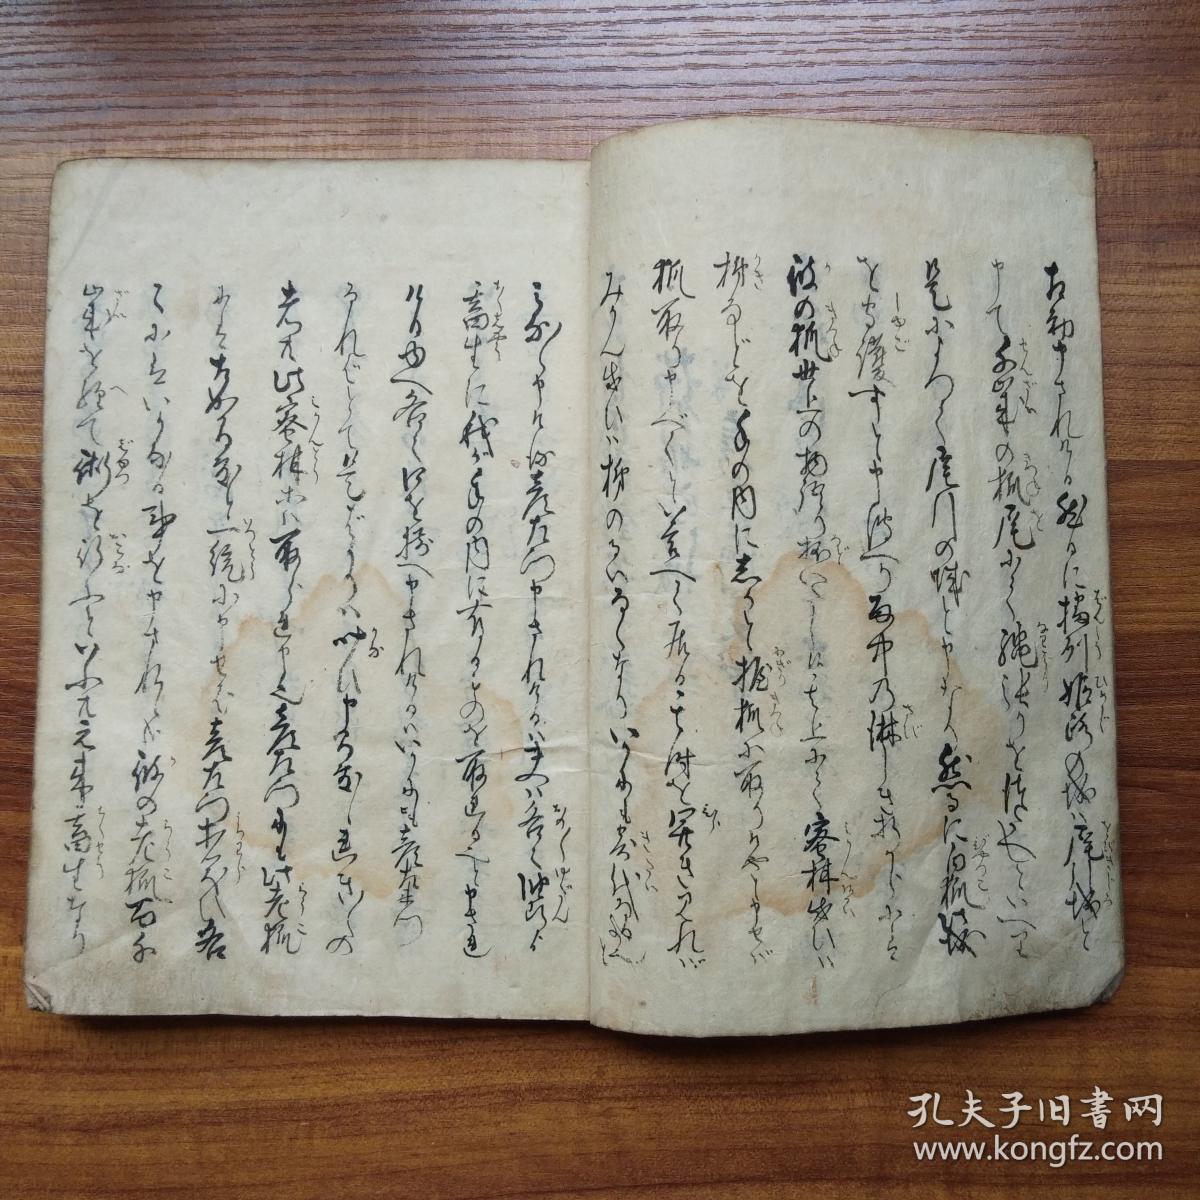 �y�fz-�y���k��(_和本《大久保武藏镫追加卷》 皮纸线装